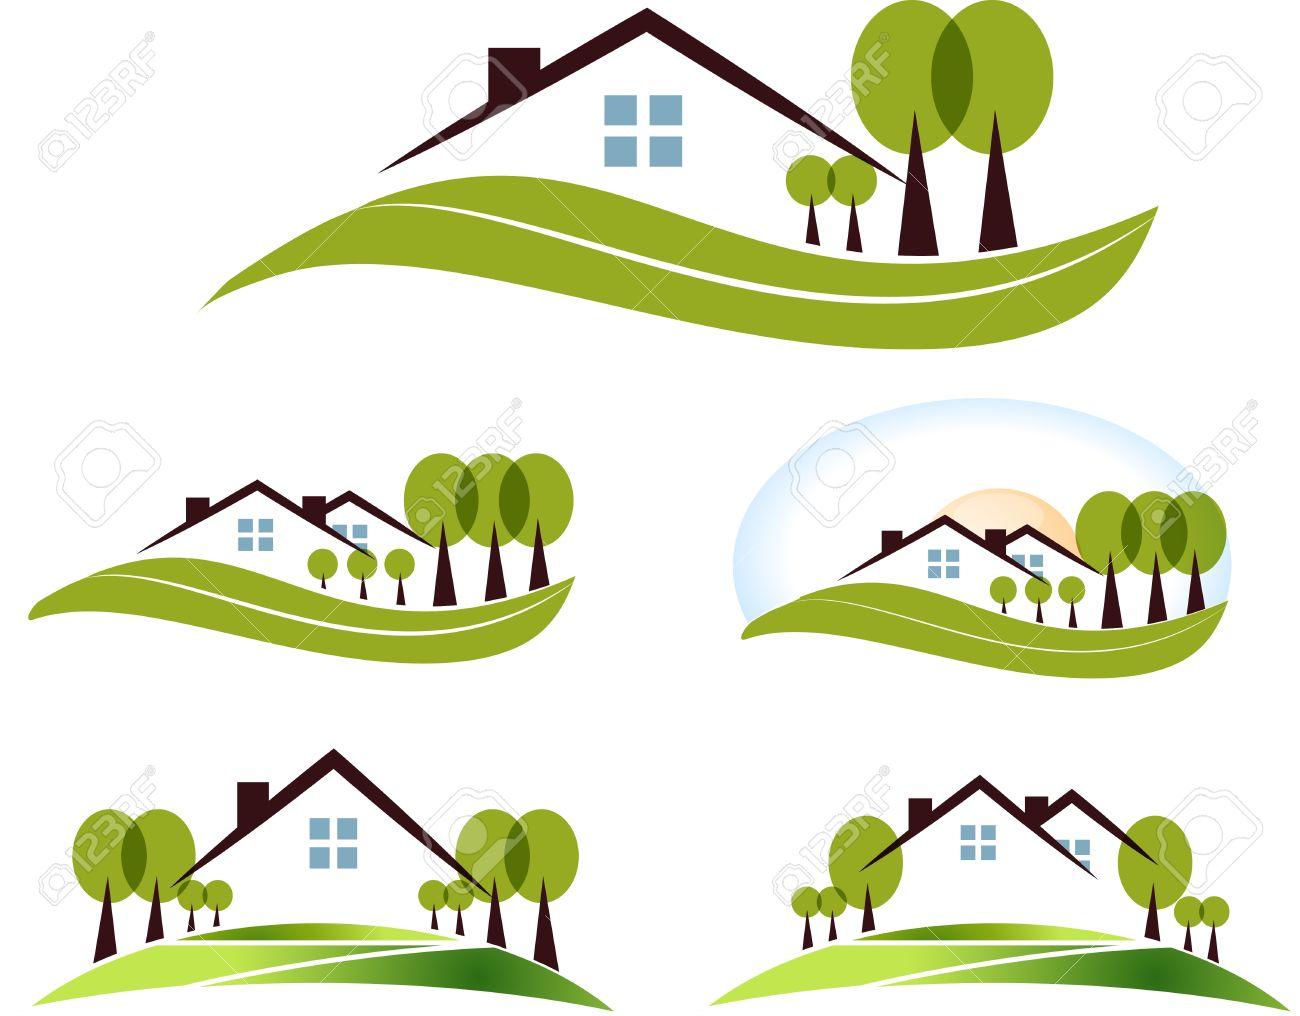 1300x1016 Lawn Clipart House Garden